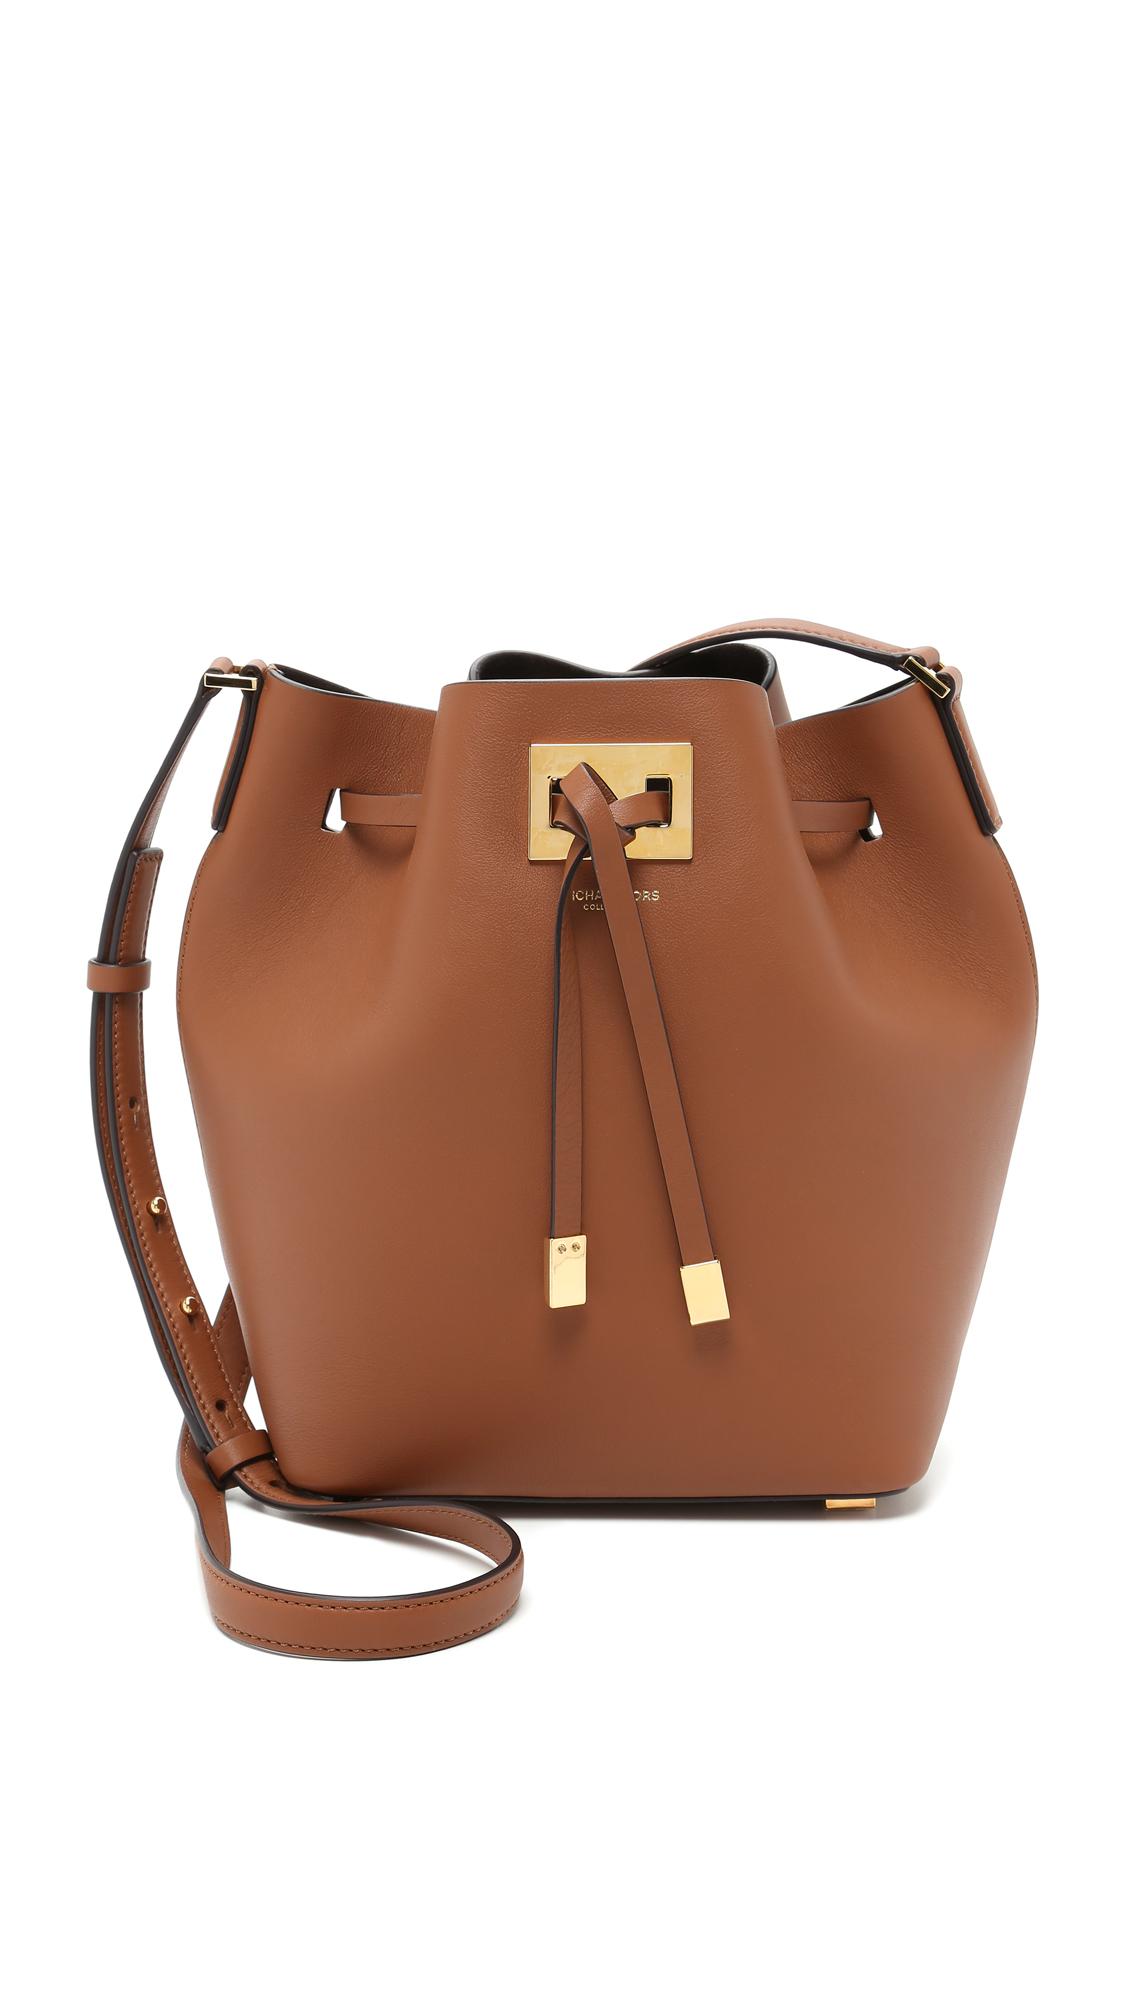 michael kors miranda medium bucket bag in brown lyst. Black Bedroom Furniture Sets. Home Design Ideas